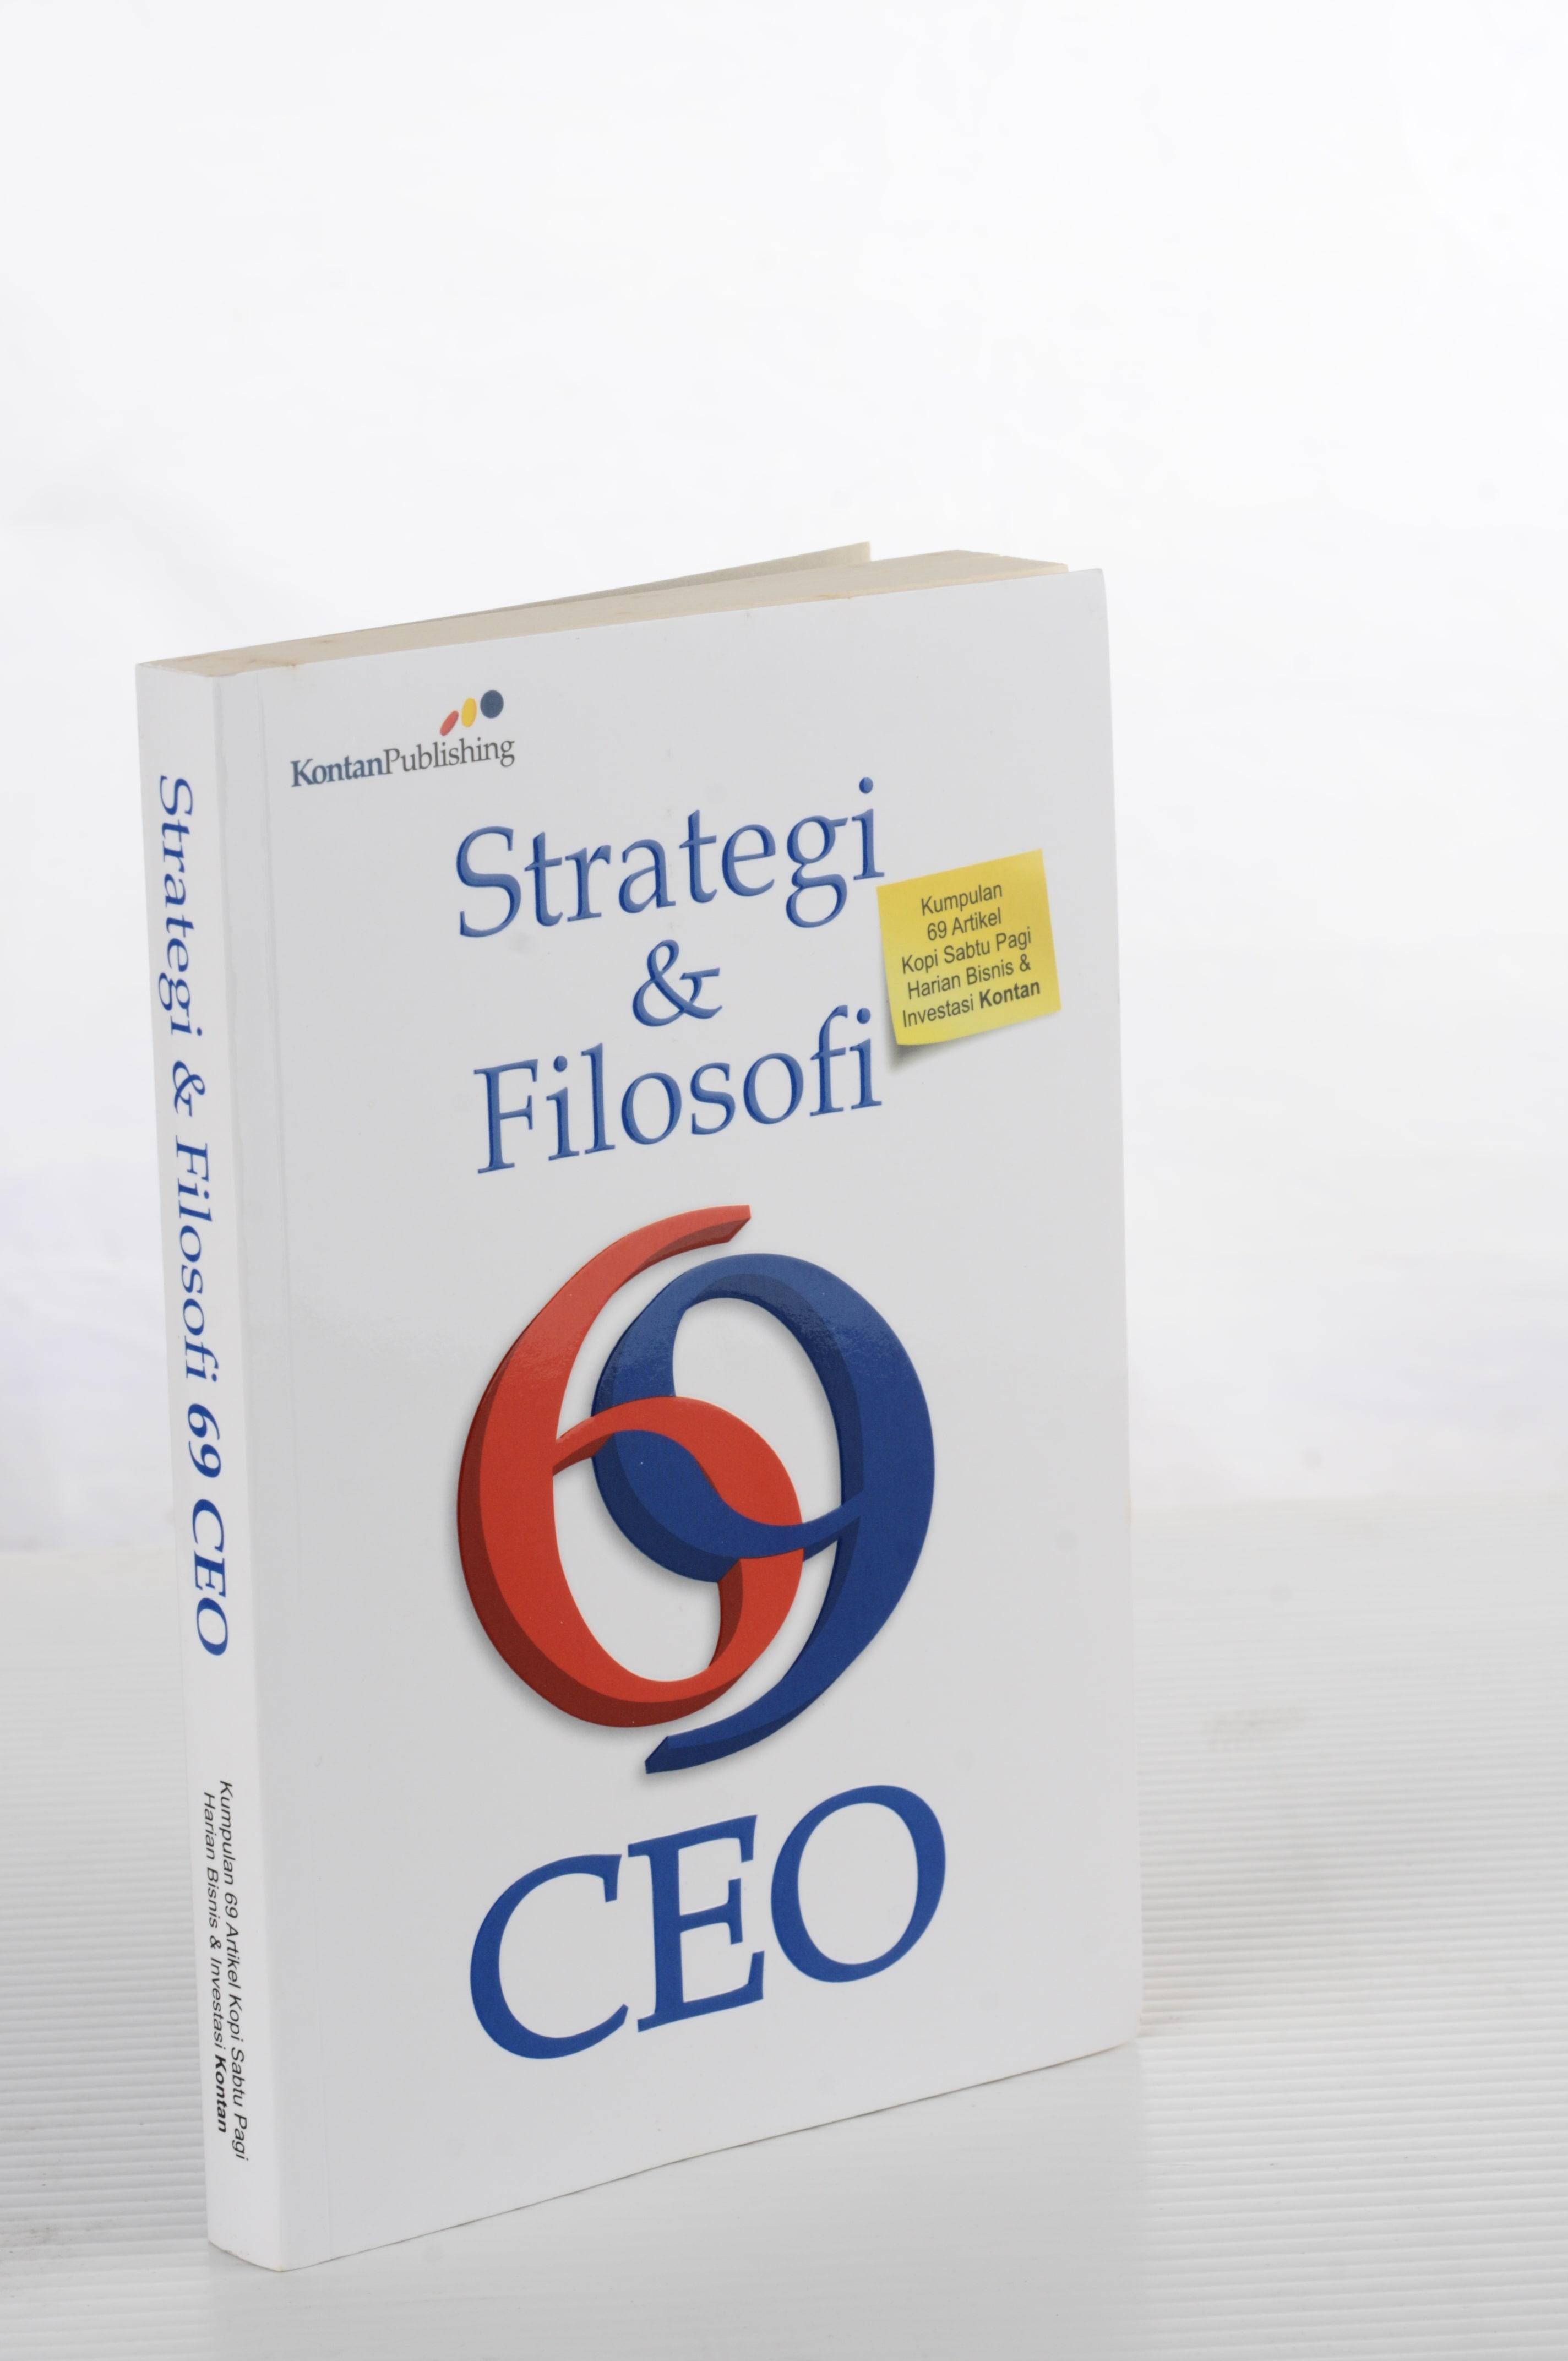 Strategi dan Filosofi 69 CEO